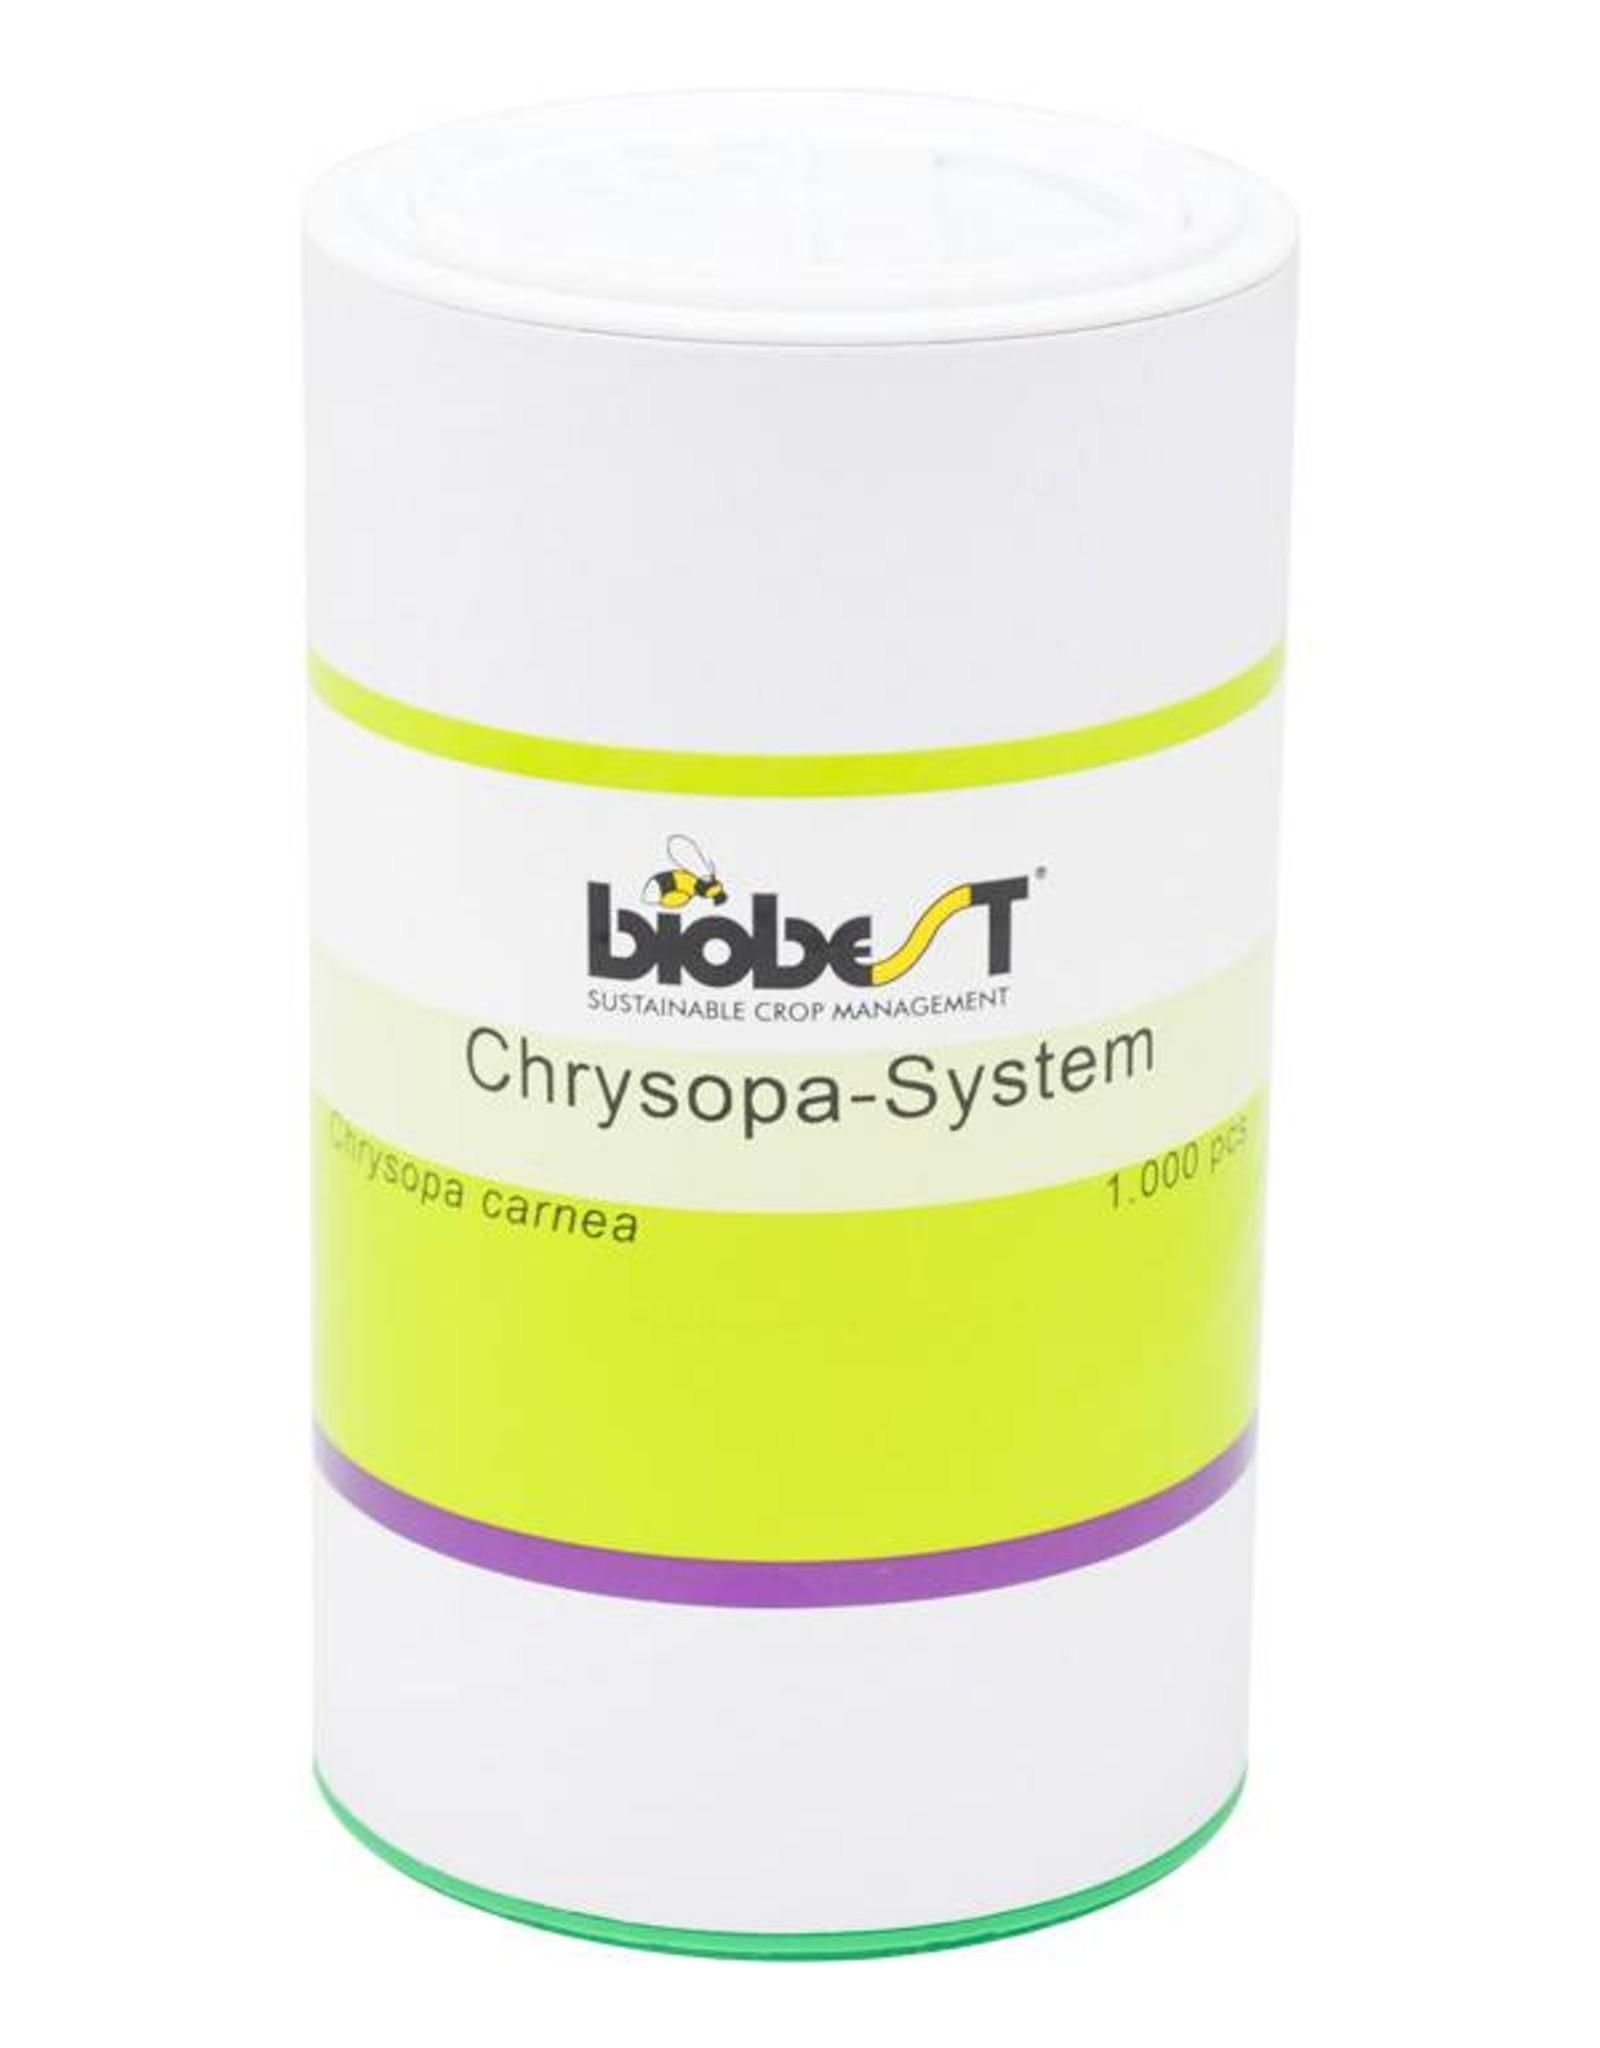 Brimex Biobest Wolluis bestrijden met gaasvlieg Chrysopa